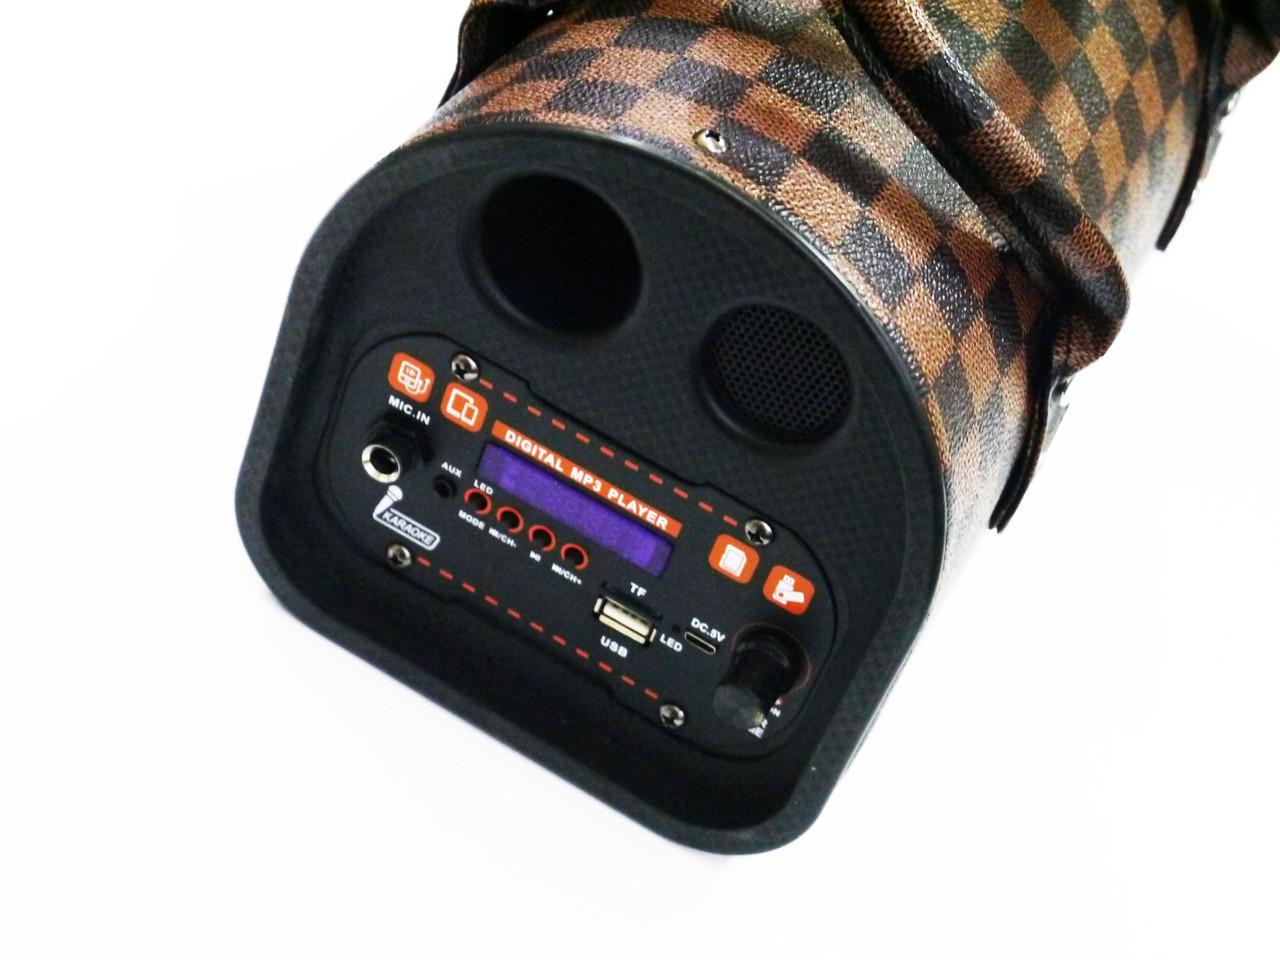 TTD-501 портативна Бездротова bluetooth колонка - валіза з караоке